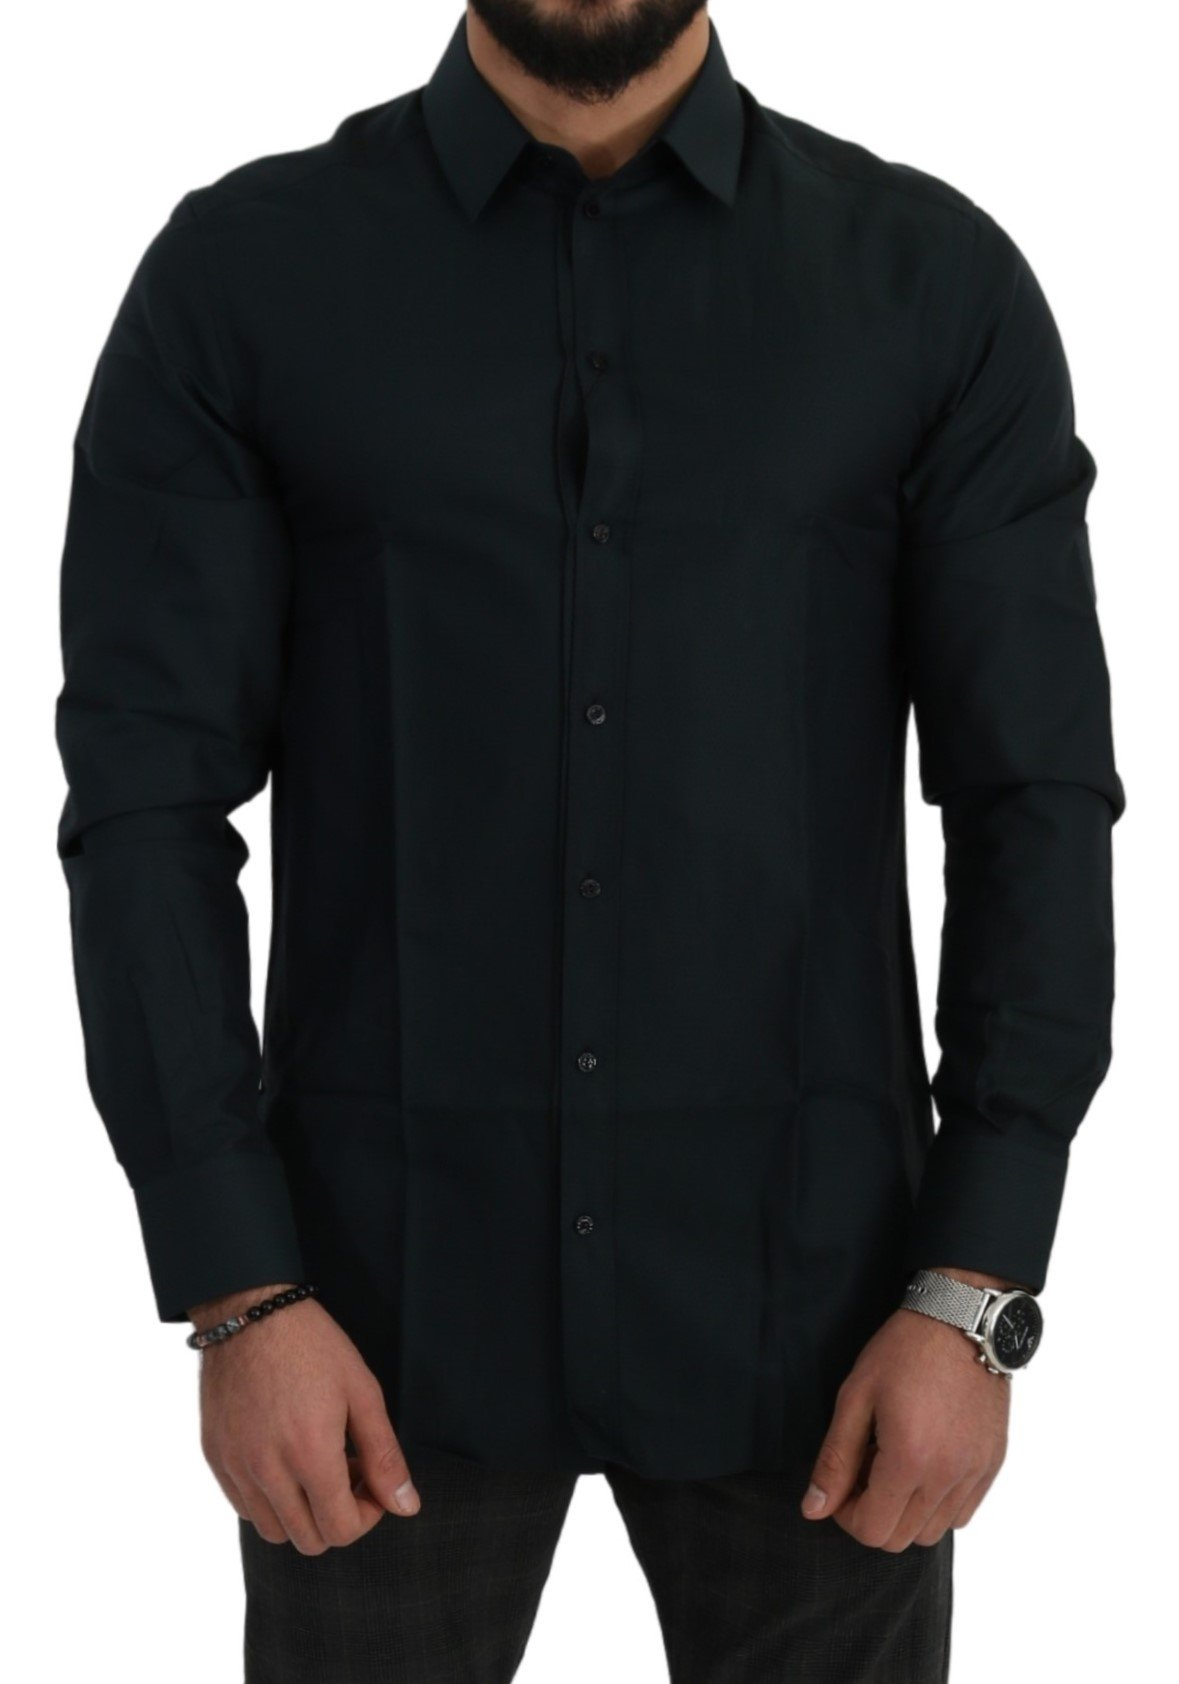 Dolce & Gabbana Men's Pattern GOLD Cotton Formal Shirt Green TSH5007 - IT41   L